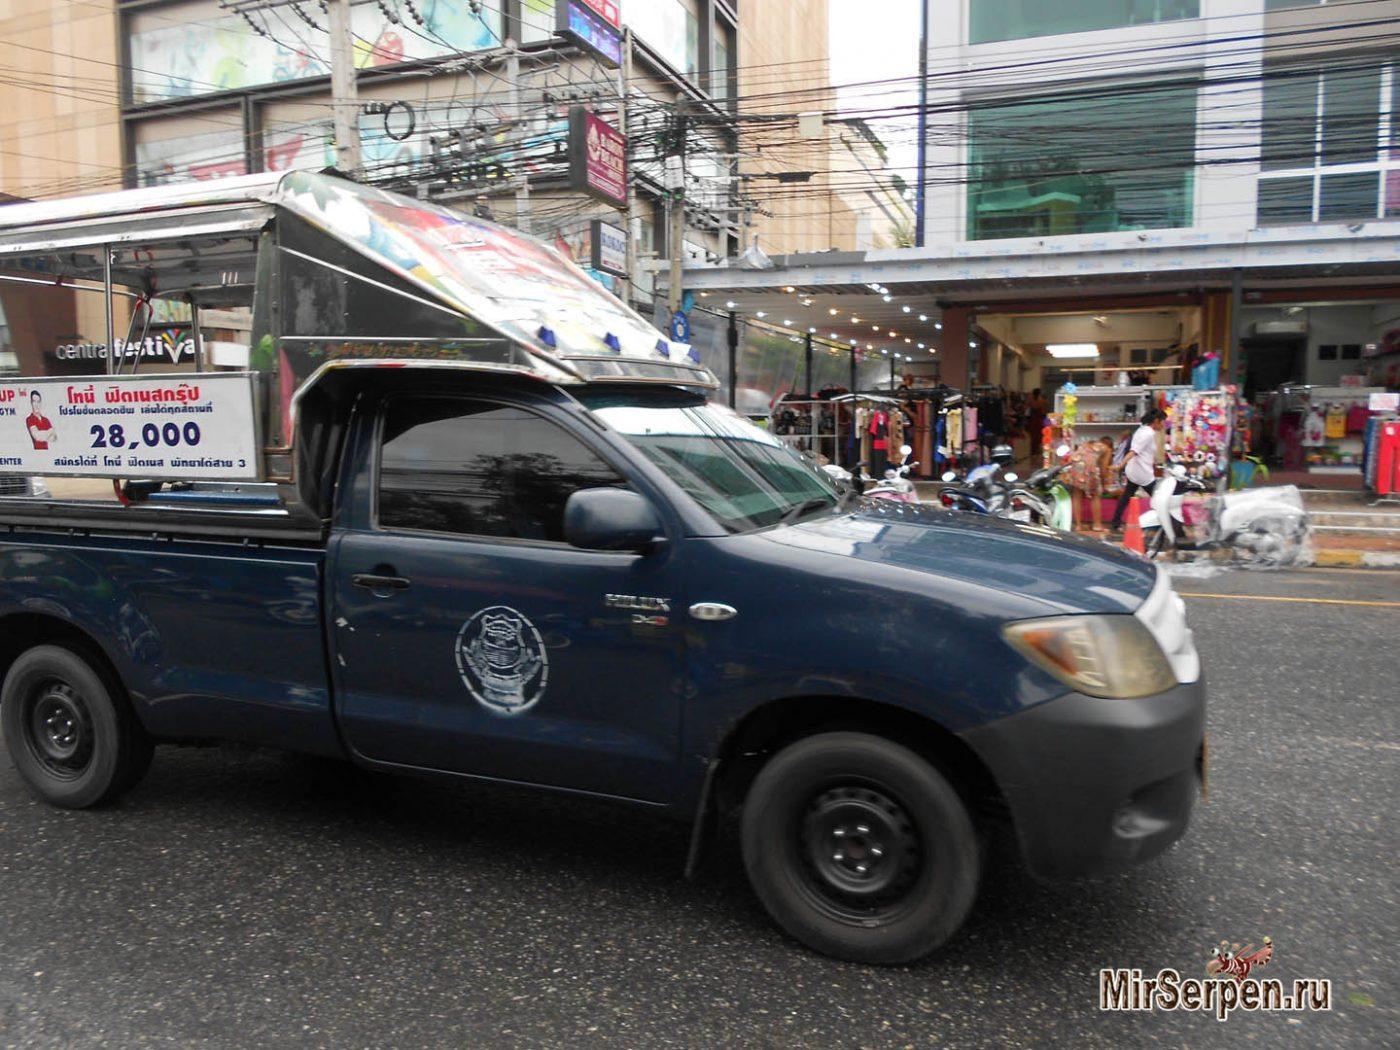 Обзор транспорта в Паттайе: тук-туки